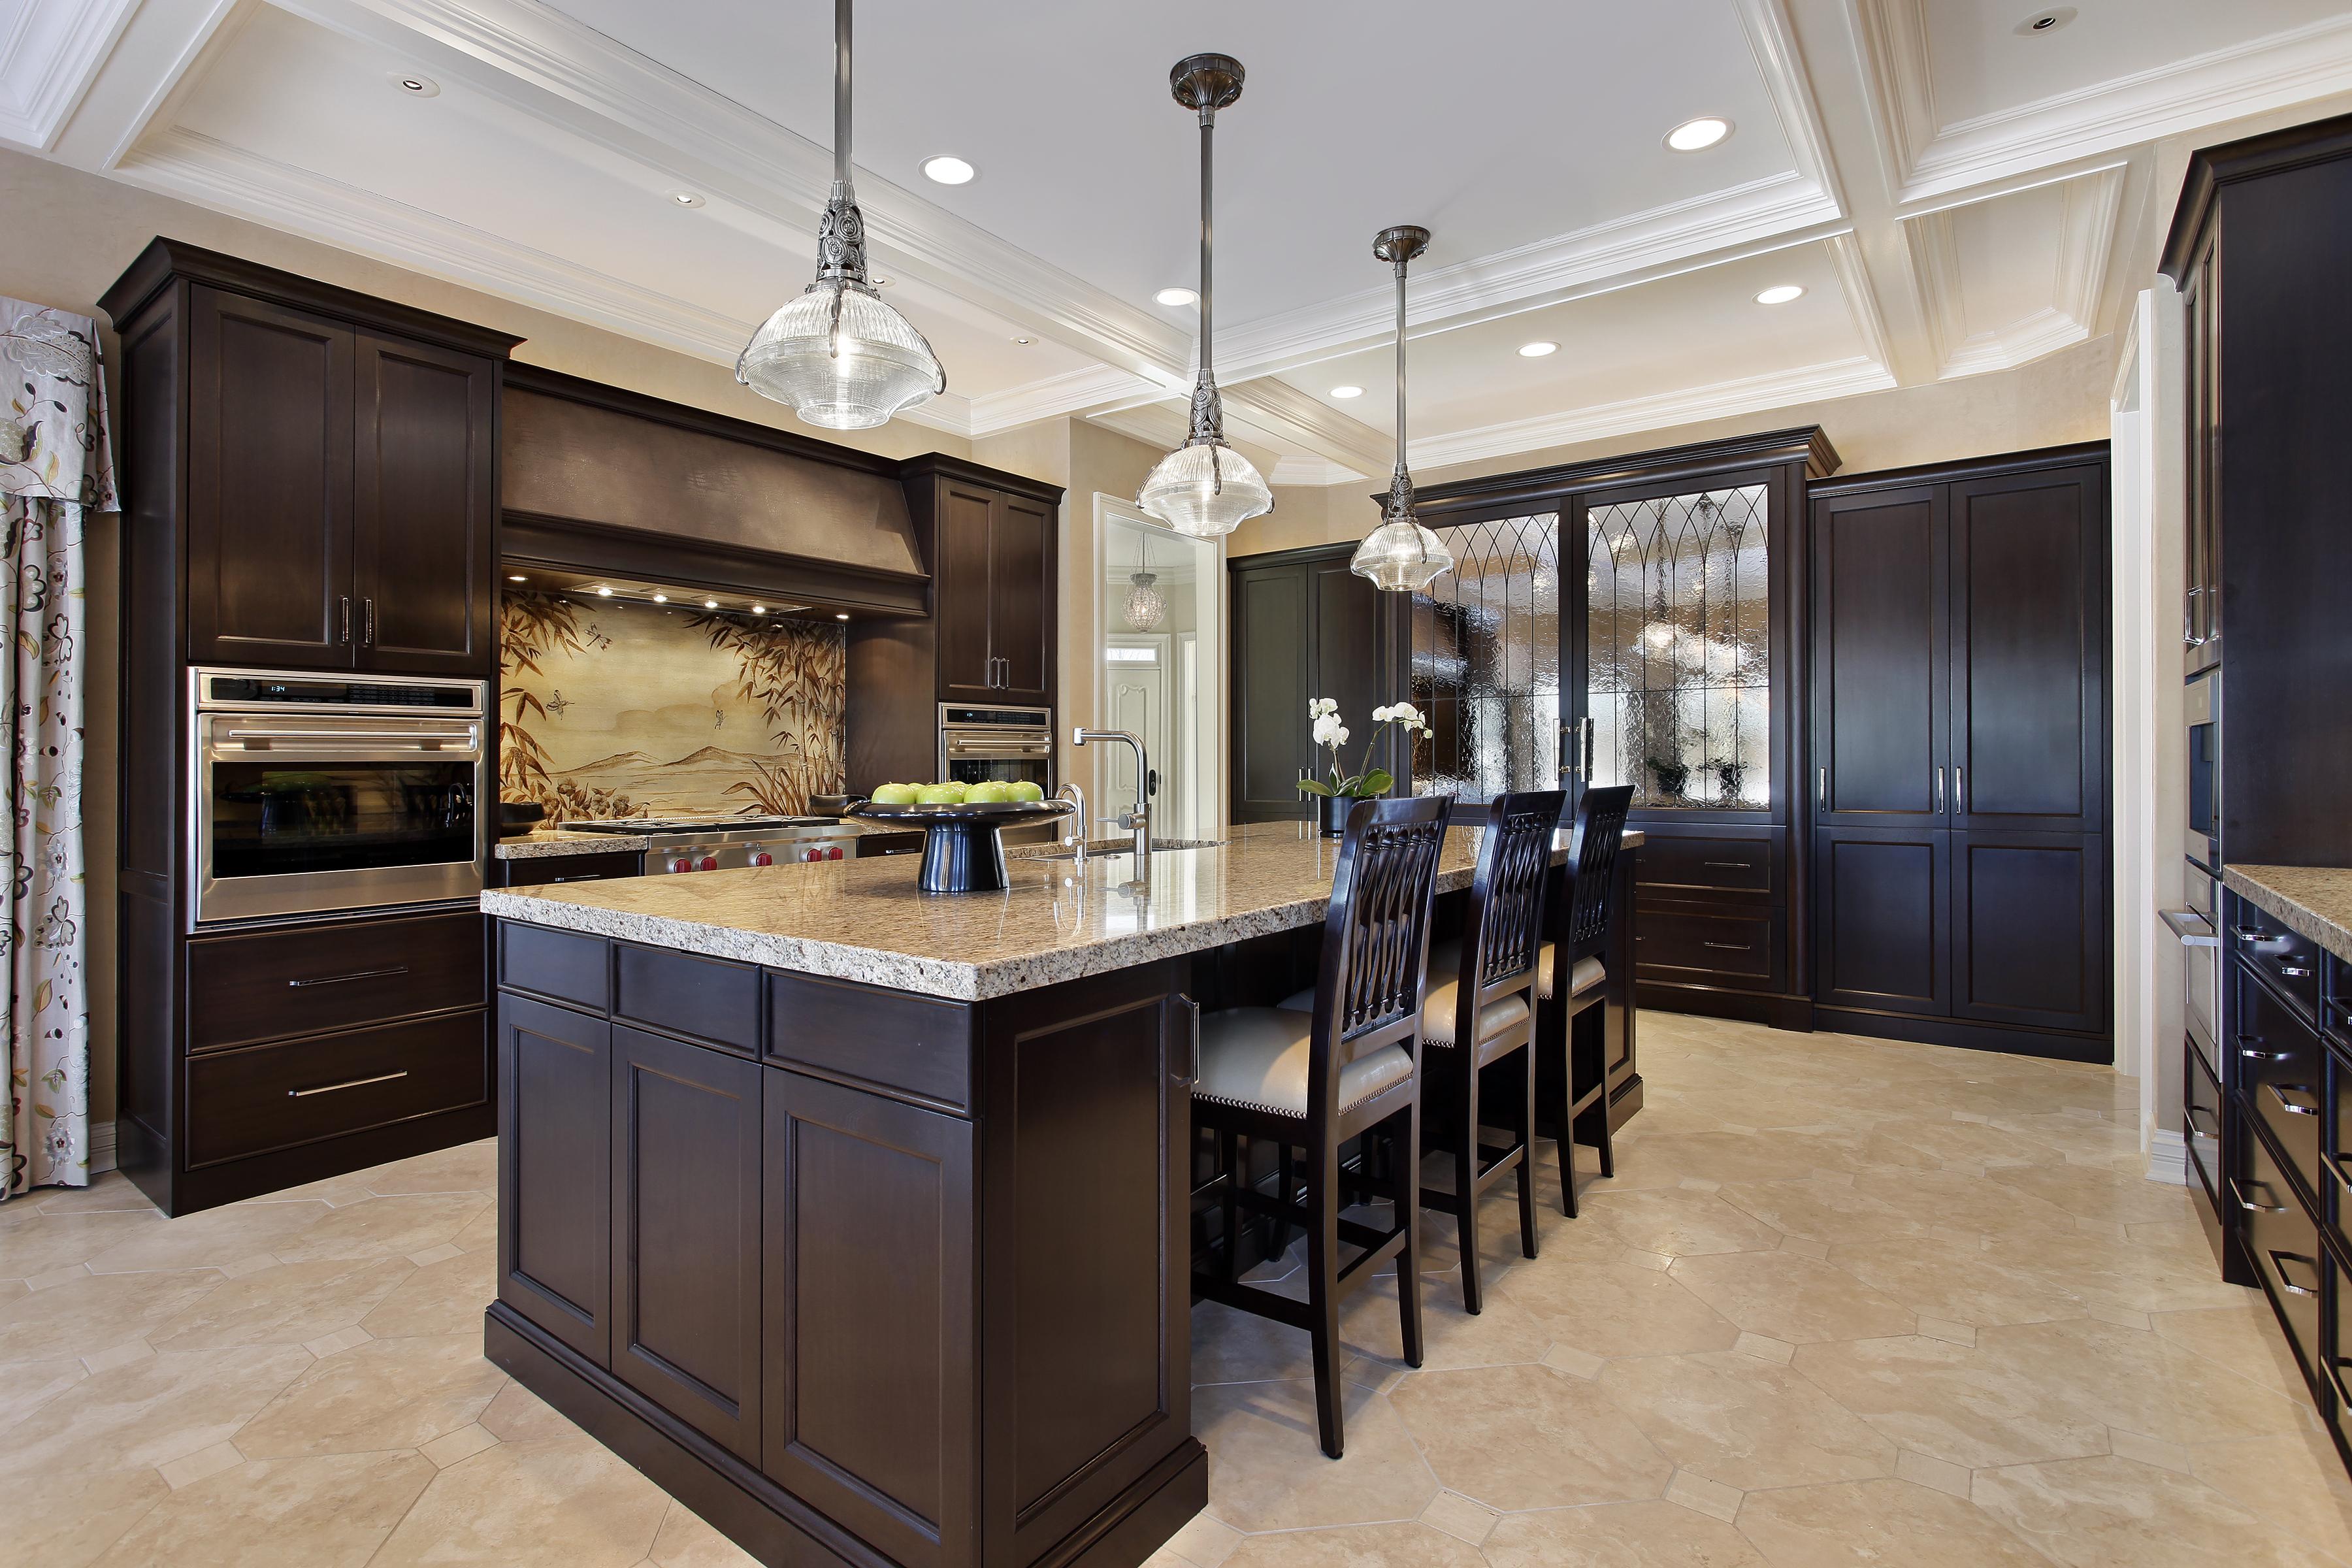 bigstock-Luxury-kitchen-in-upscale-home-33664604